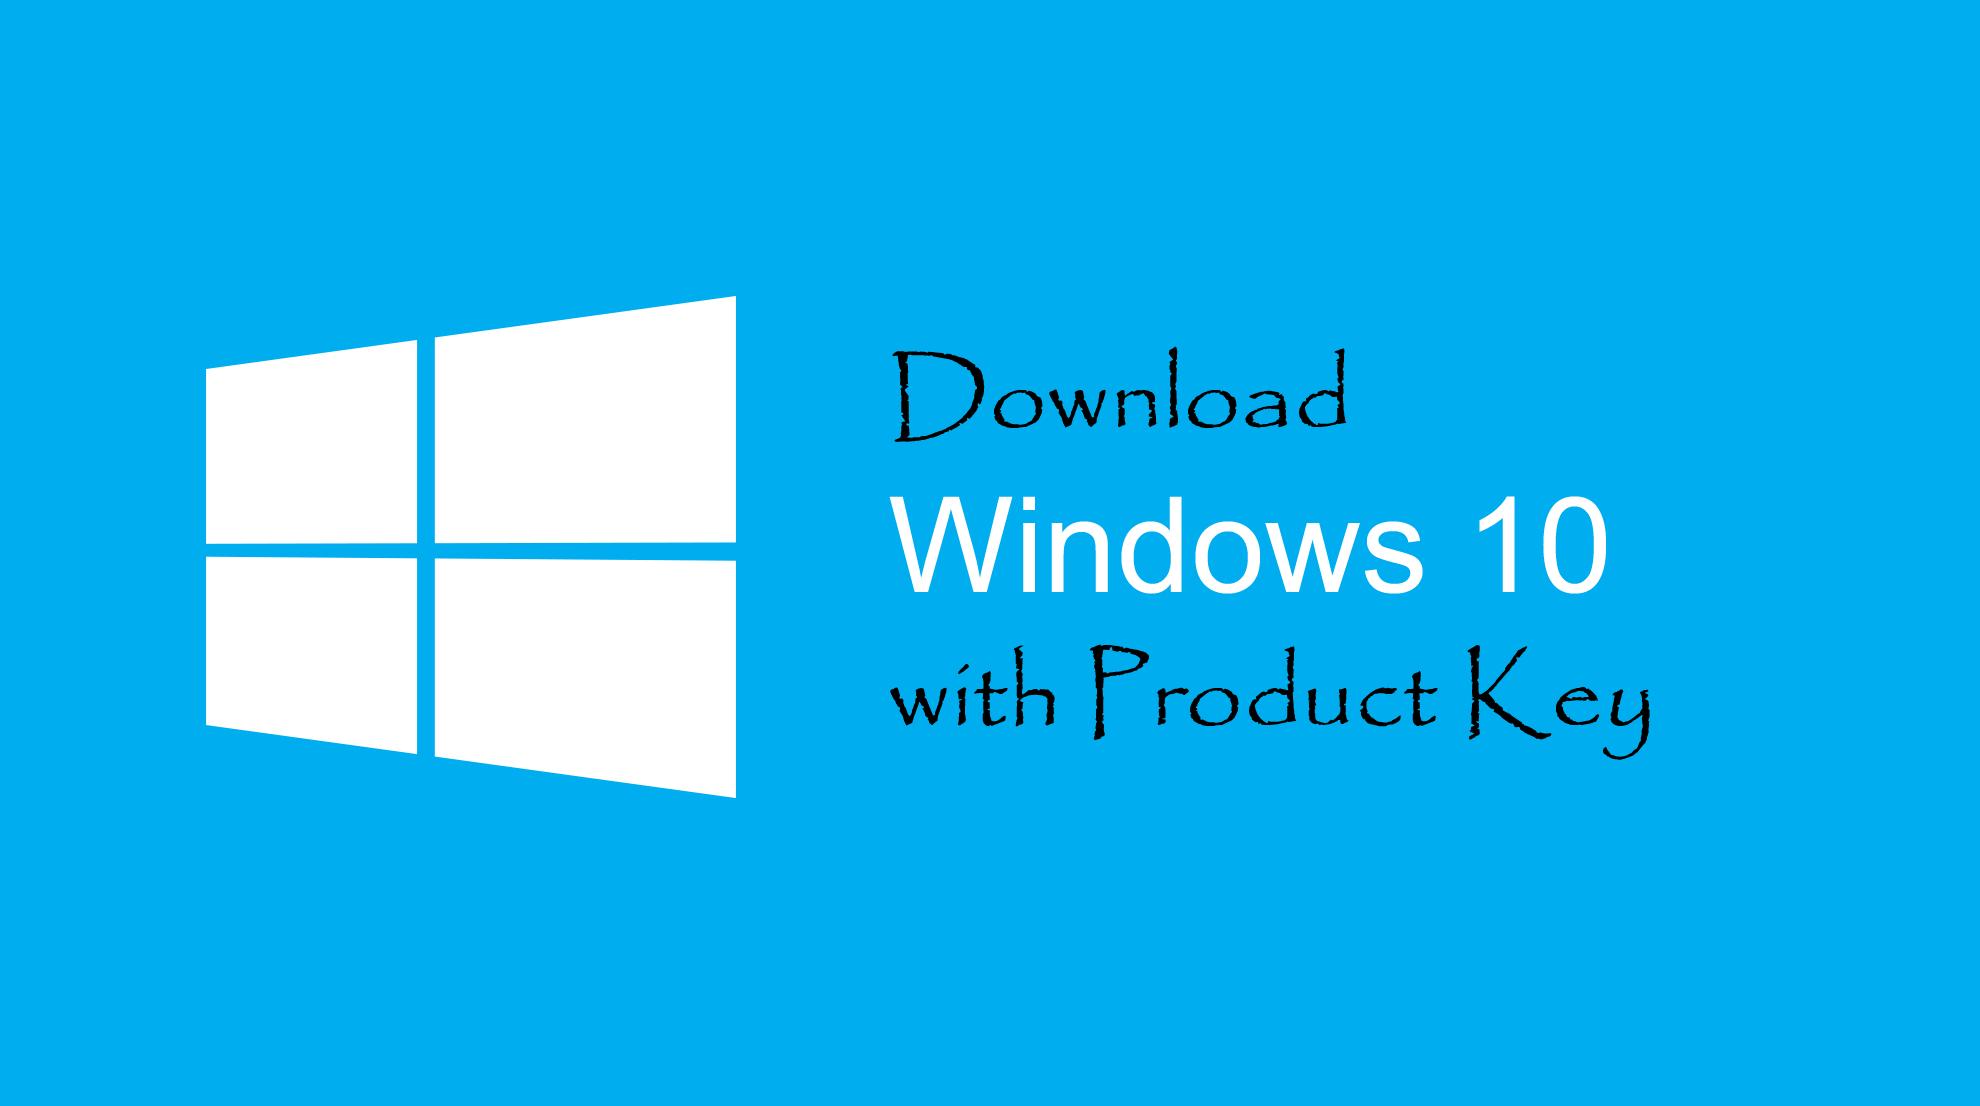 download-windows-10-key